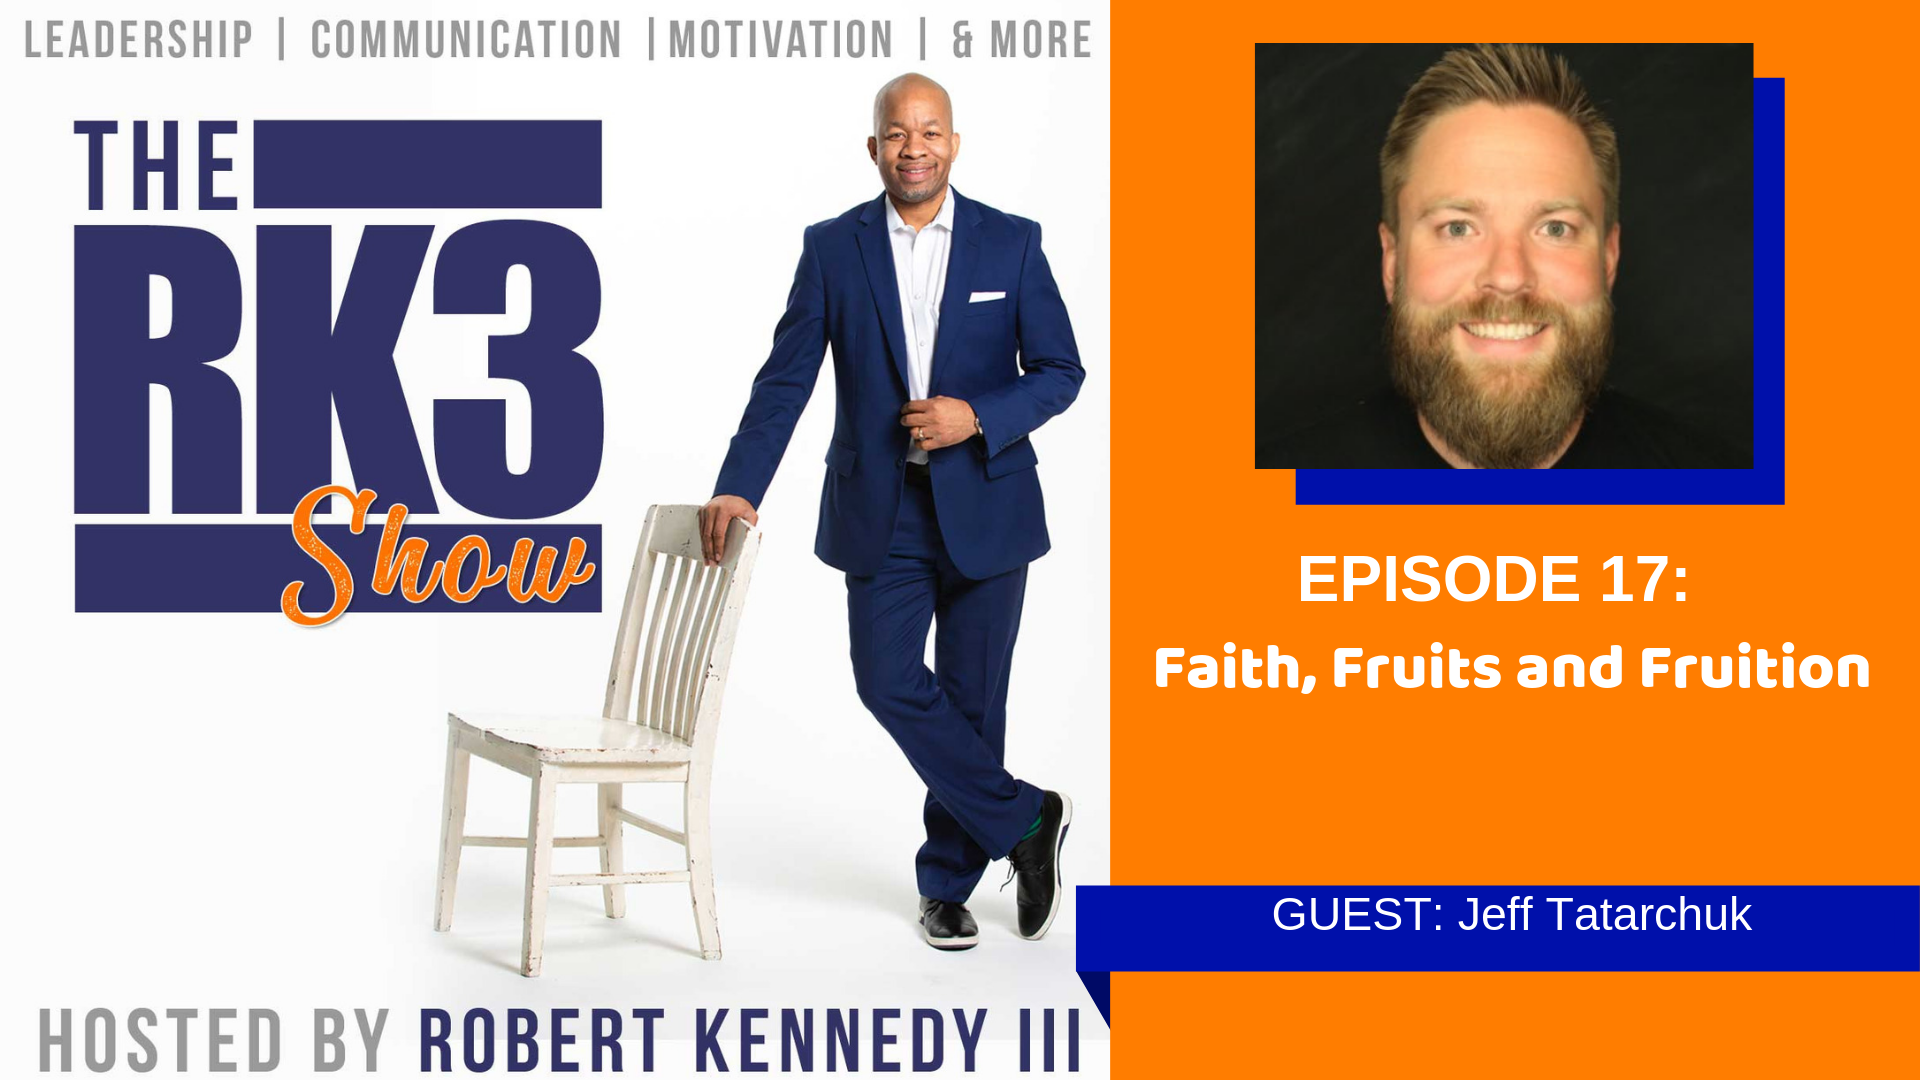 Faith, Fruits, and Fruition